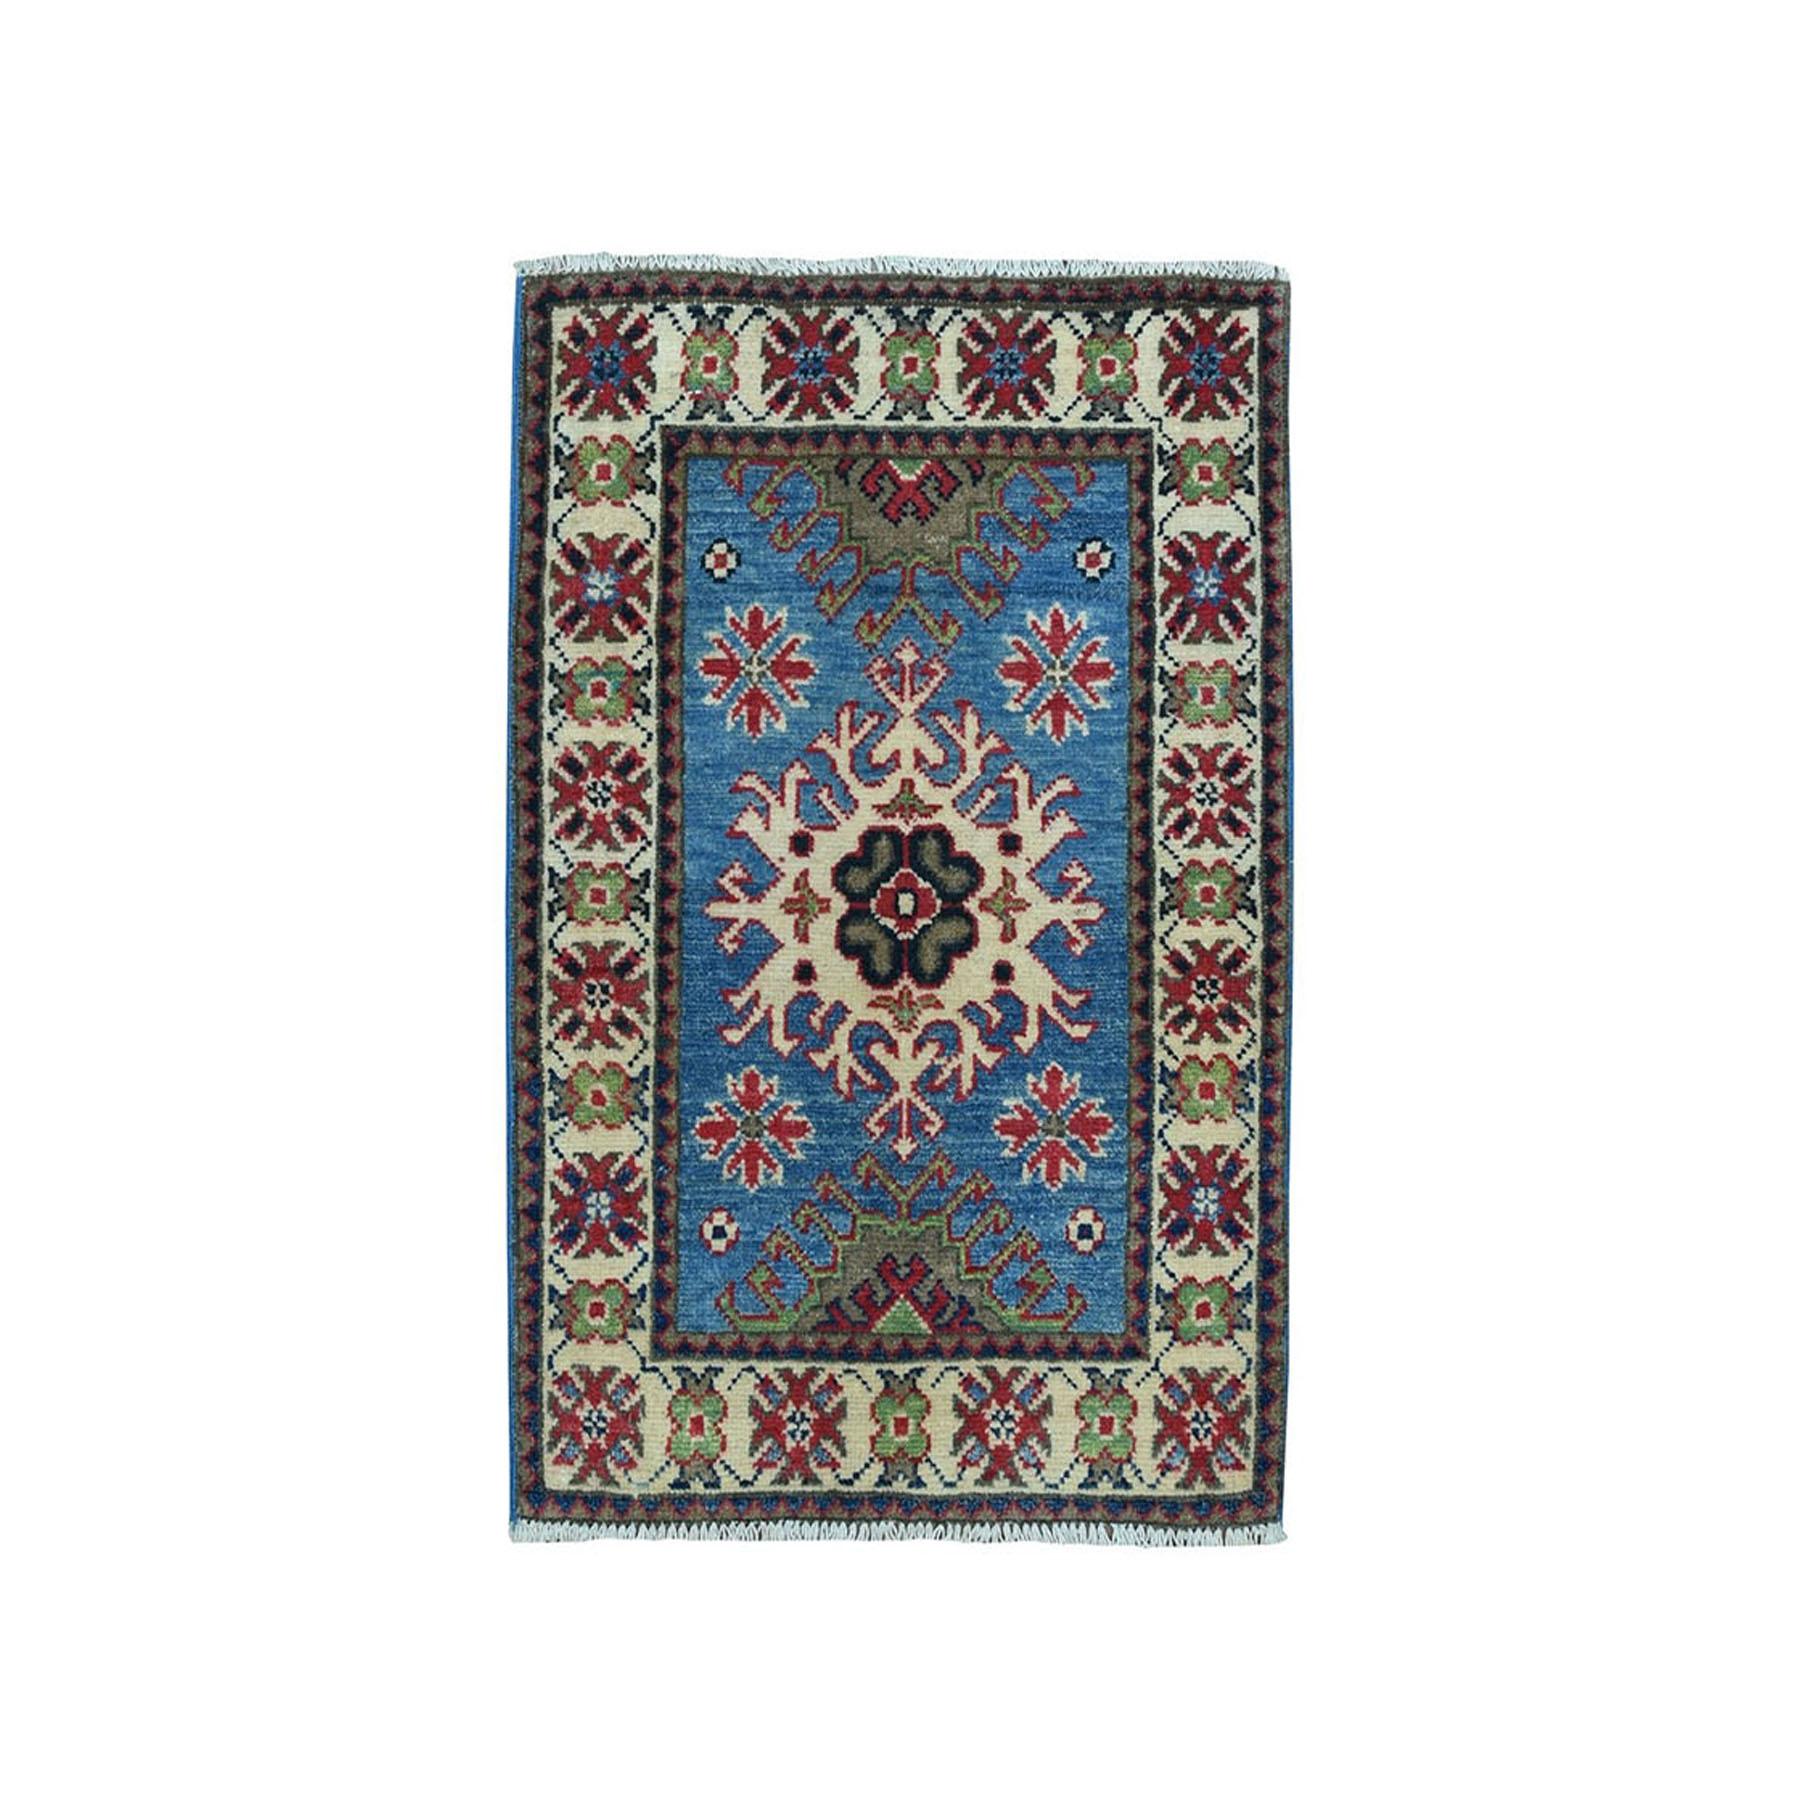 "2'X2'10"" Blue Geometric Design Kazak Pure Wool Hand-Knotted Oriental Rug moaea000"